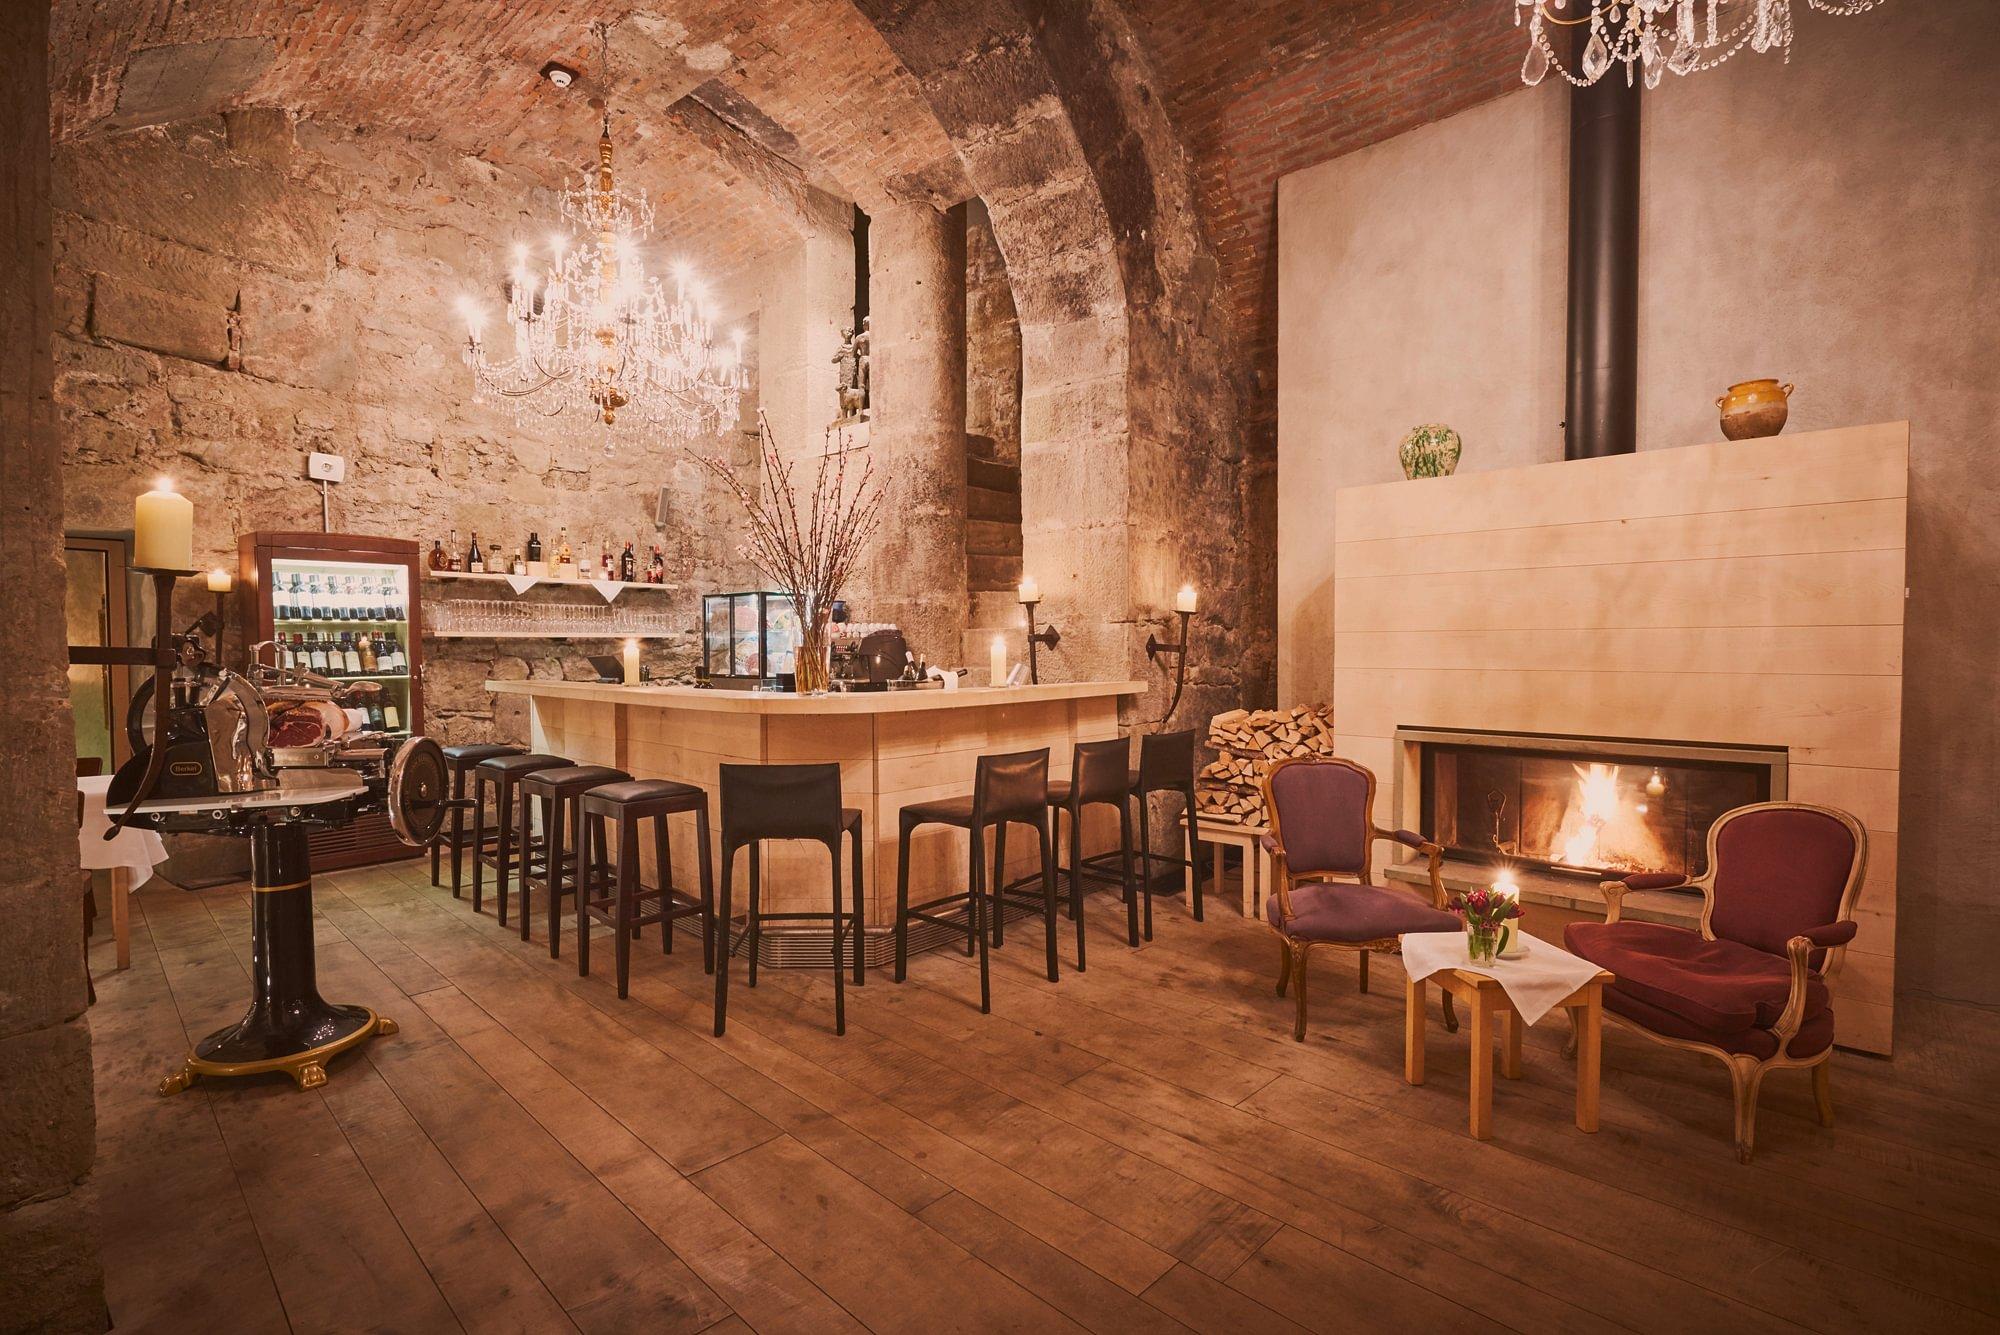 verdi ristorante in bern. Black Bedroom Furniture Sets. Home Design Ideas